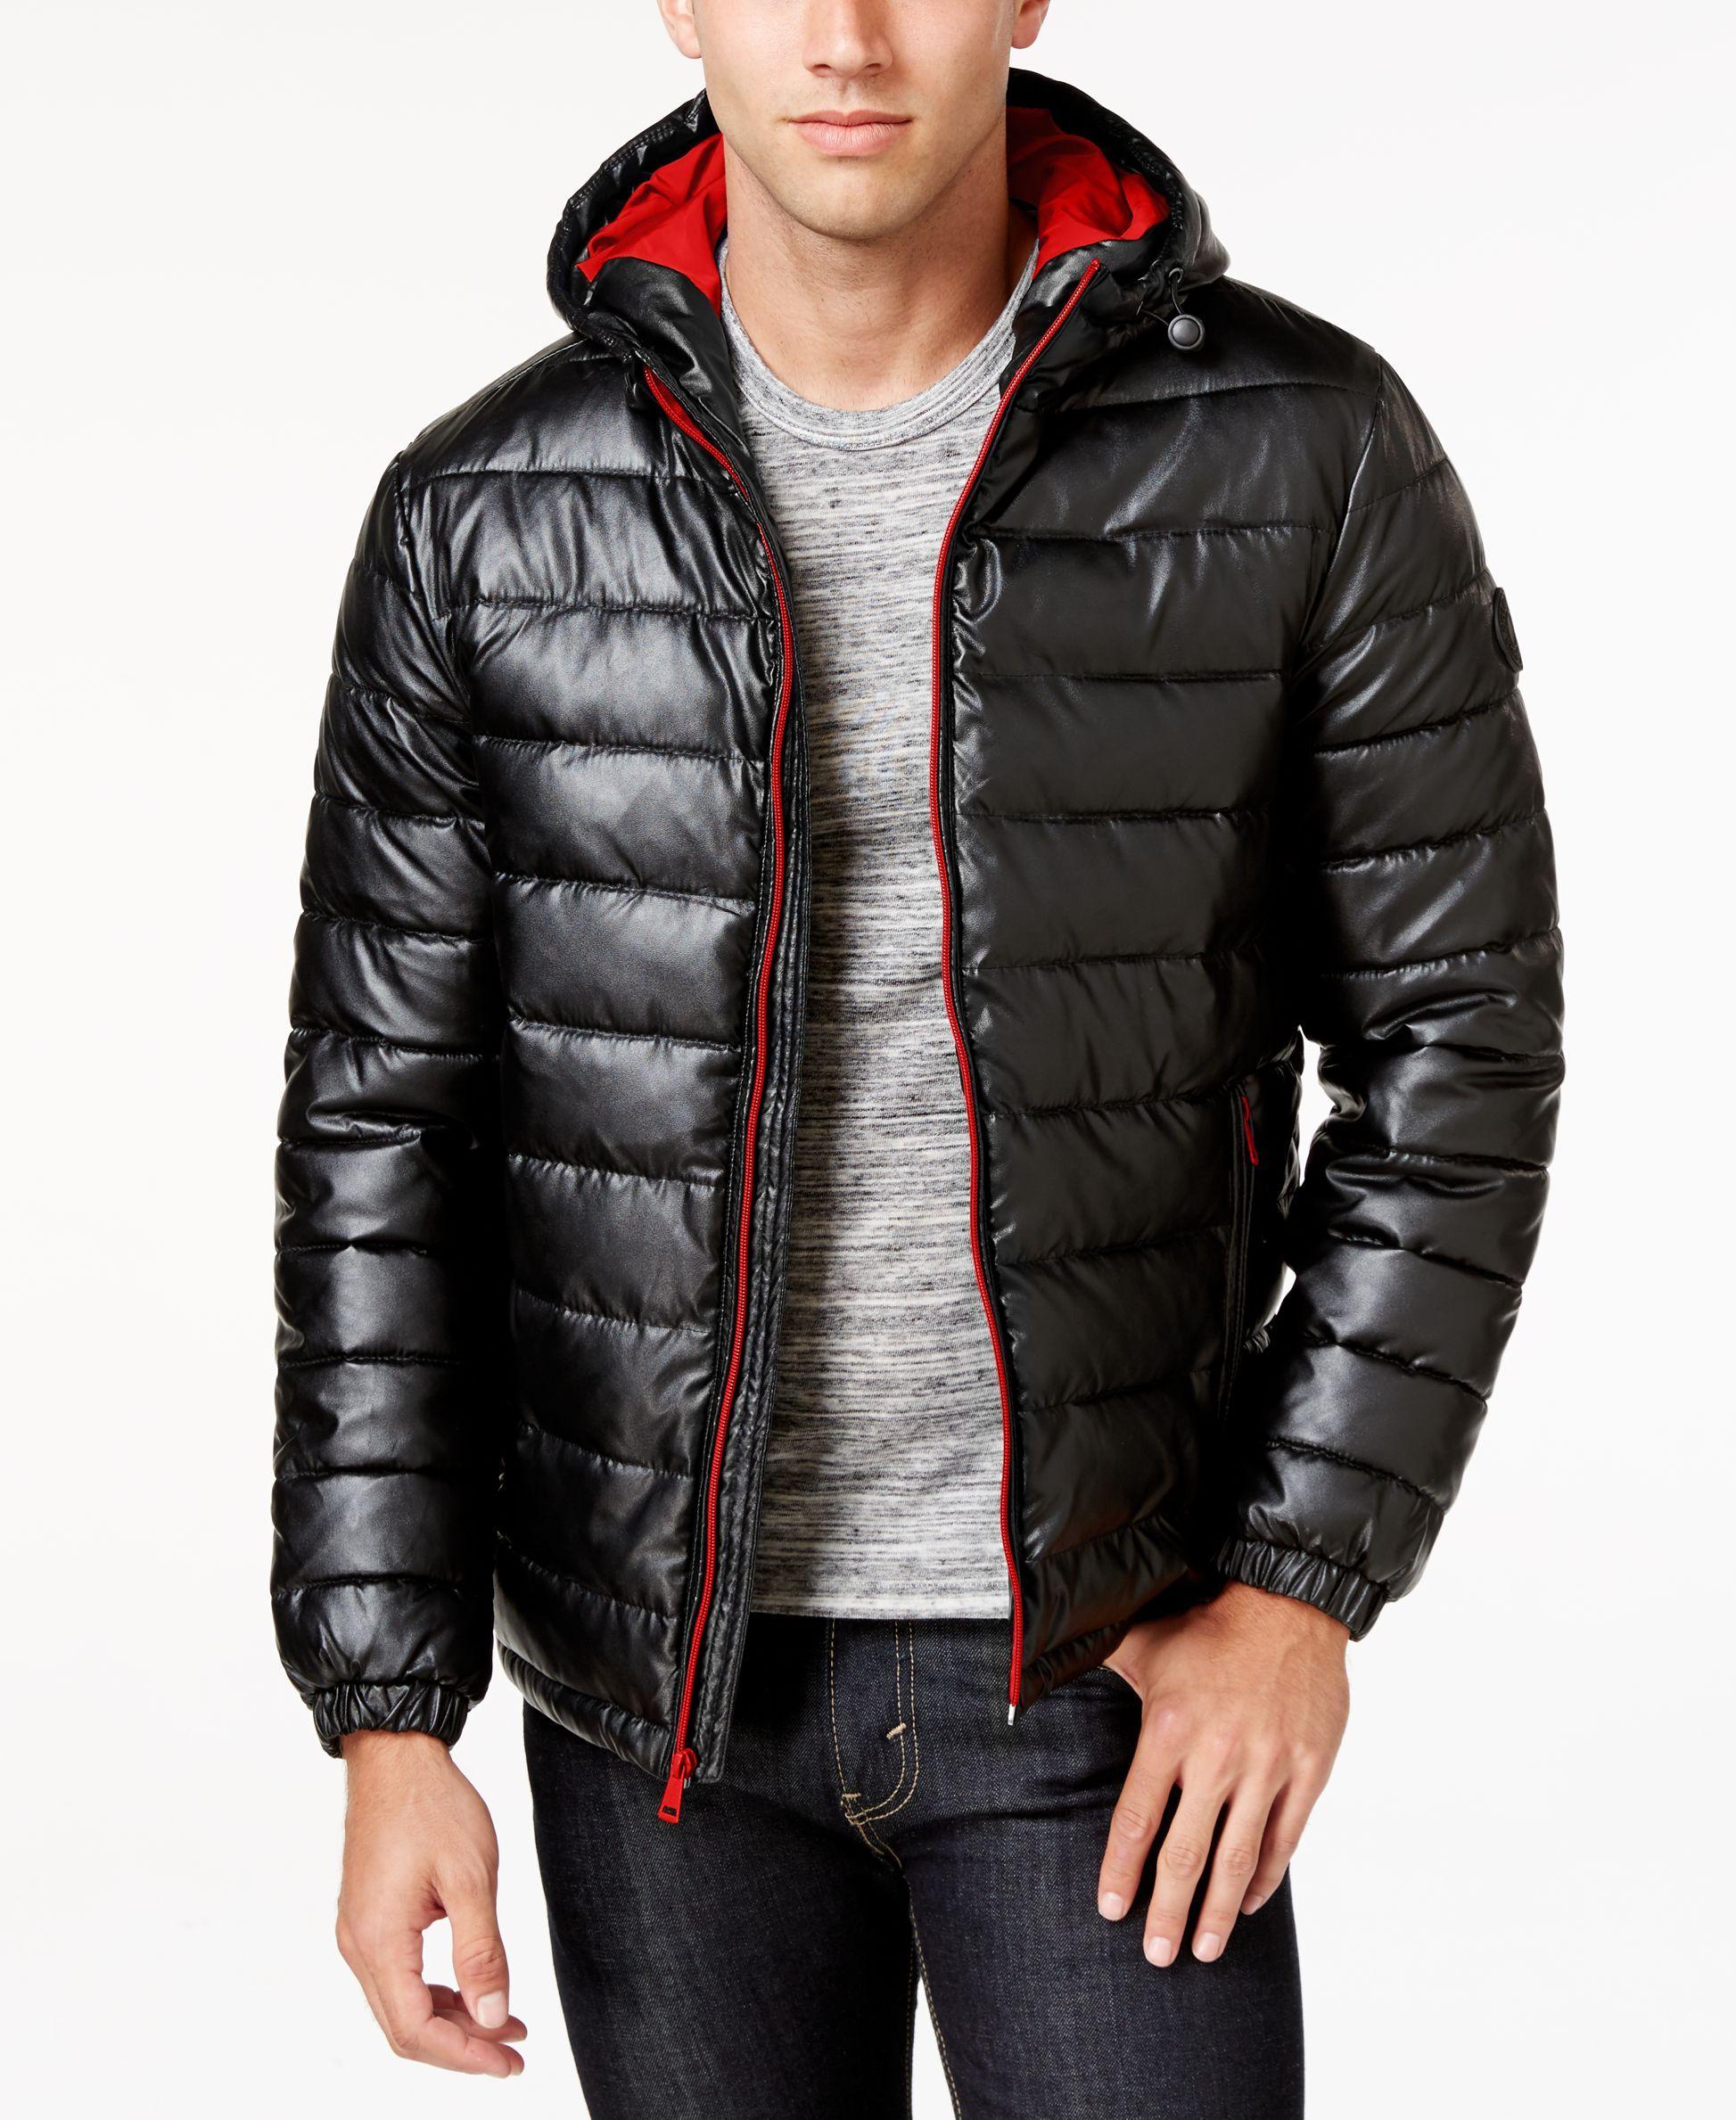 Men's FauxLeather Puffer Coat Stylish jackets, Cole